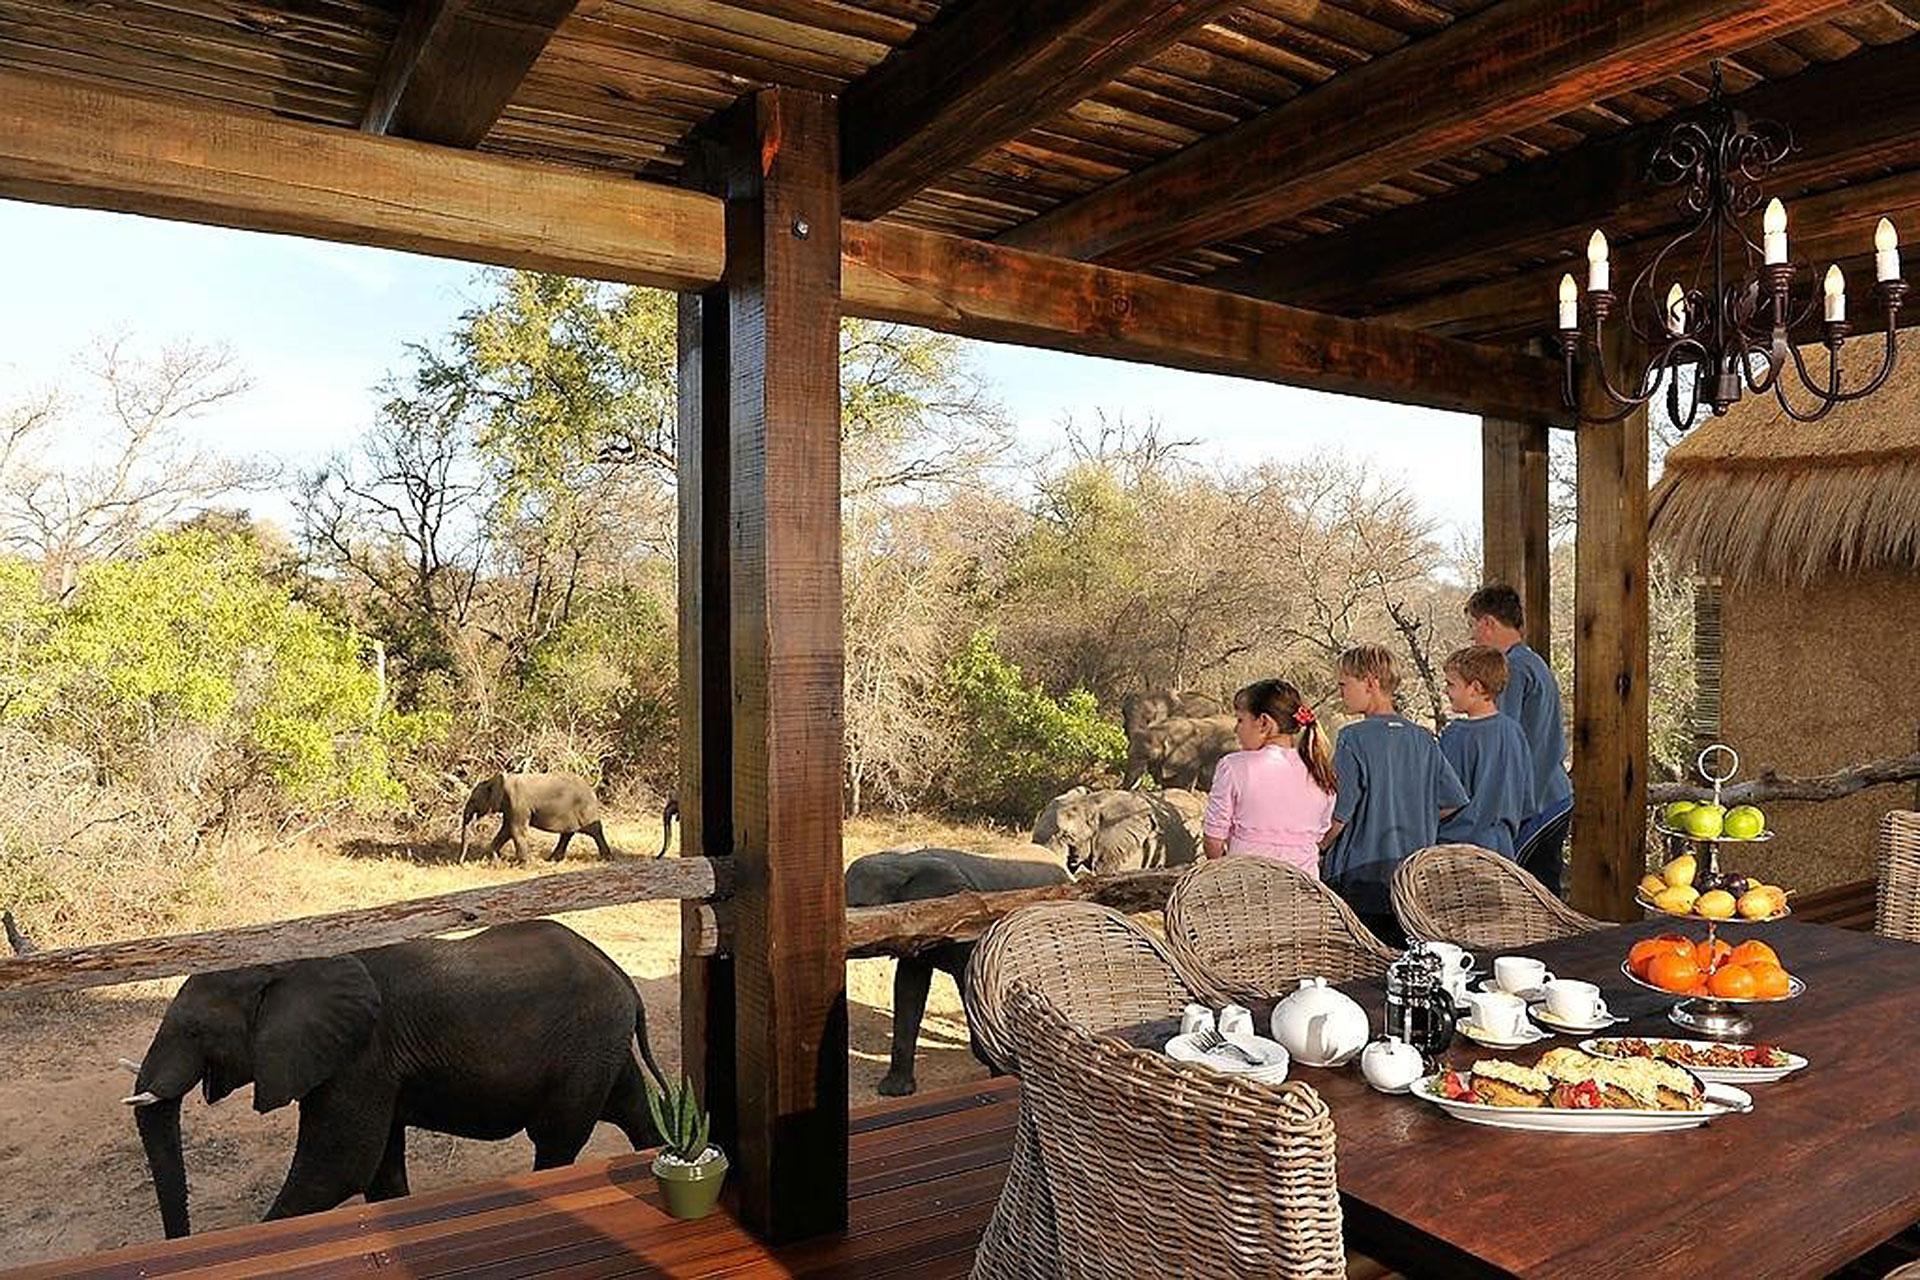 Family at Jambulani Safari in South Africa; Courtesy of Jambulani Safari